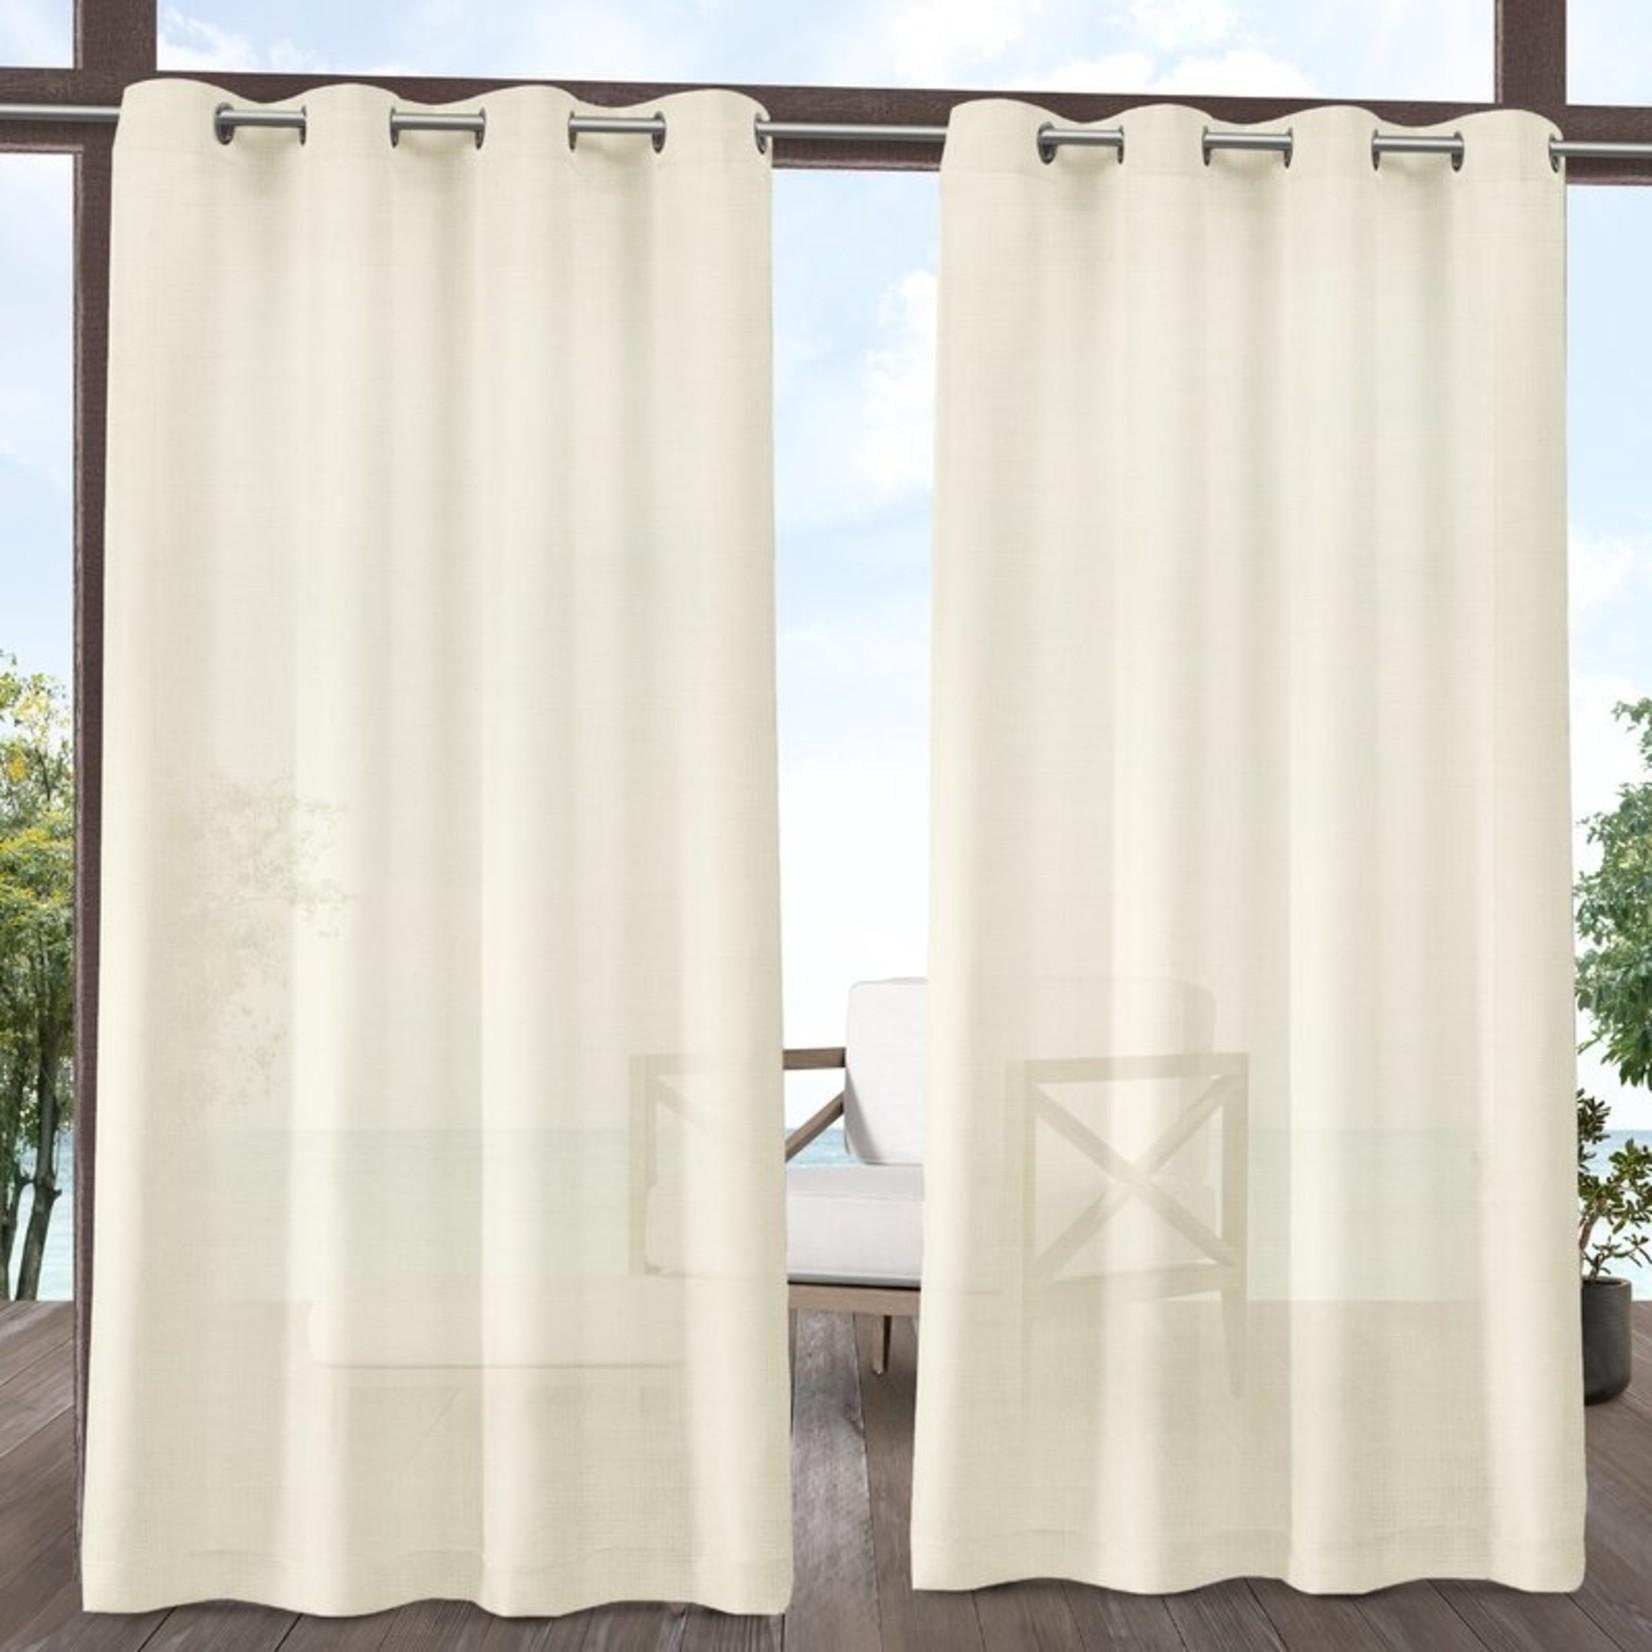 "*54"" x 96"" - Malaya Solid Semi-Sheer Grommet Curtain Panels - Set of 2 - Ivory"